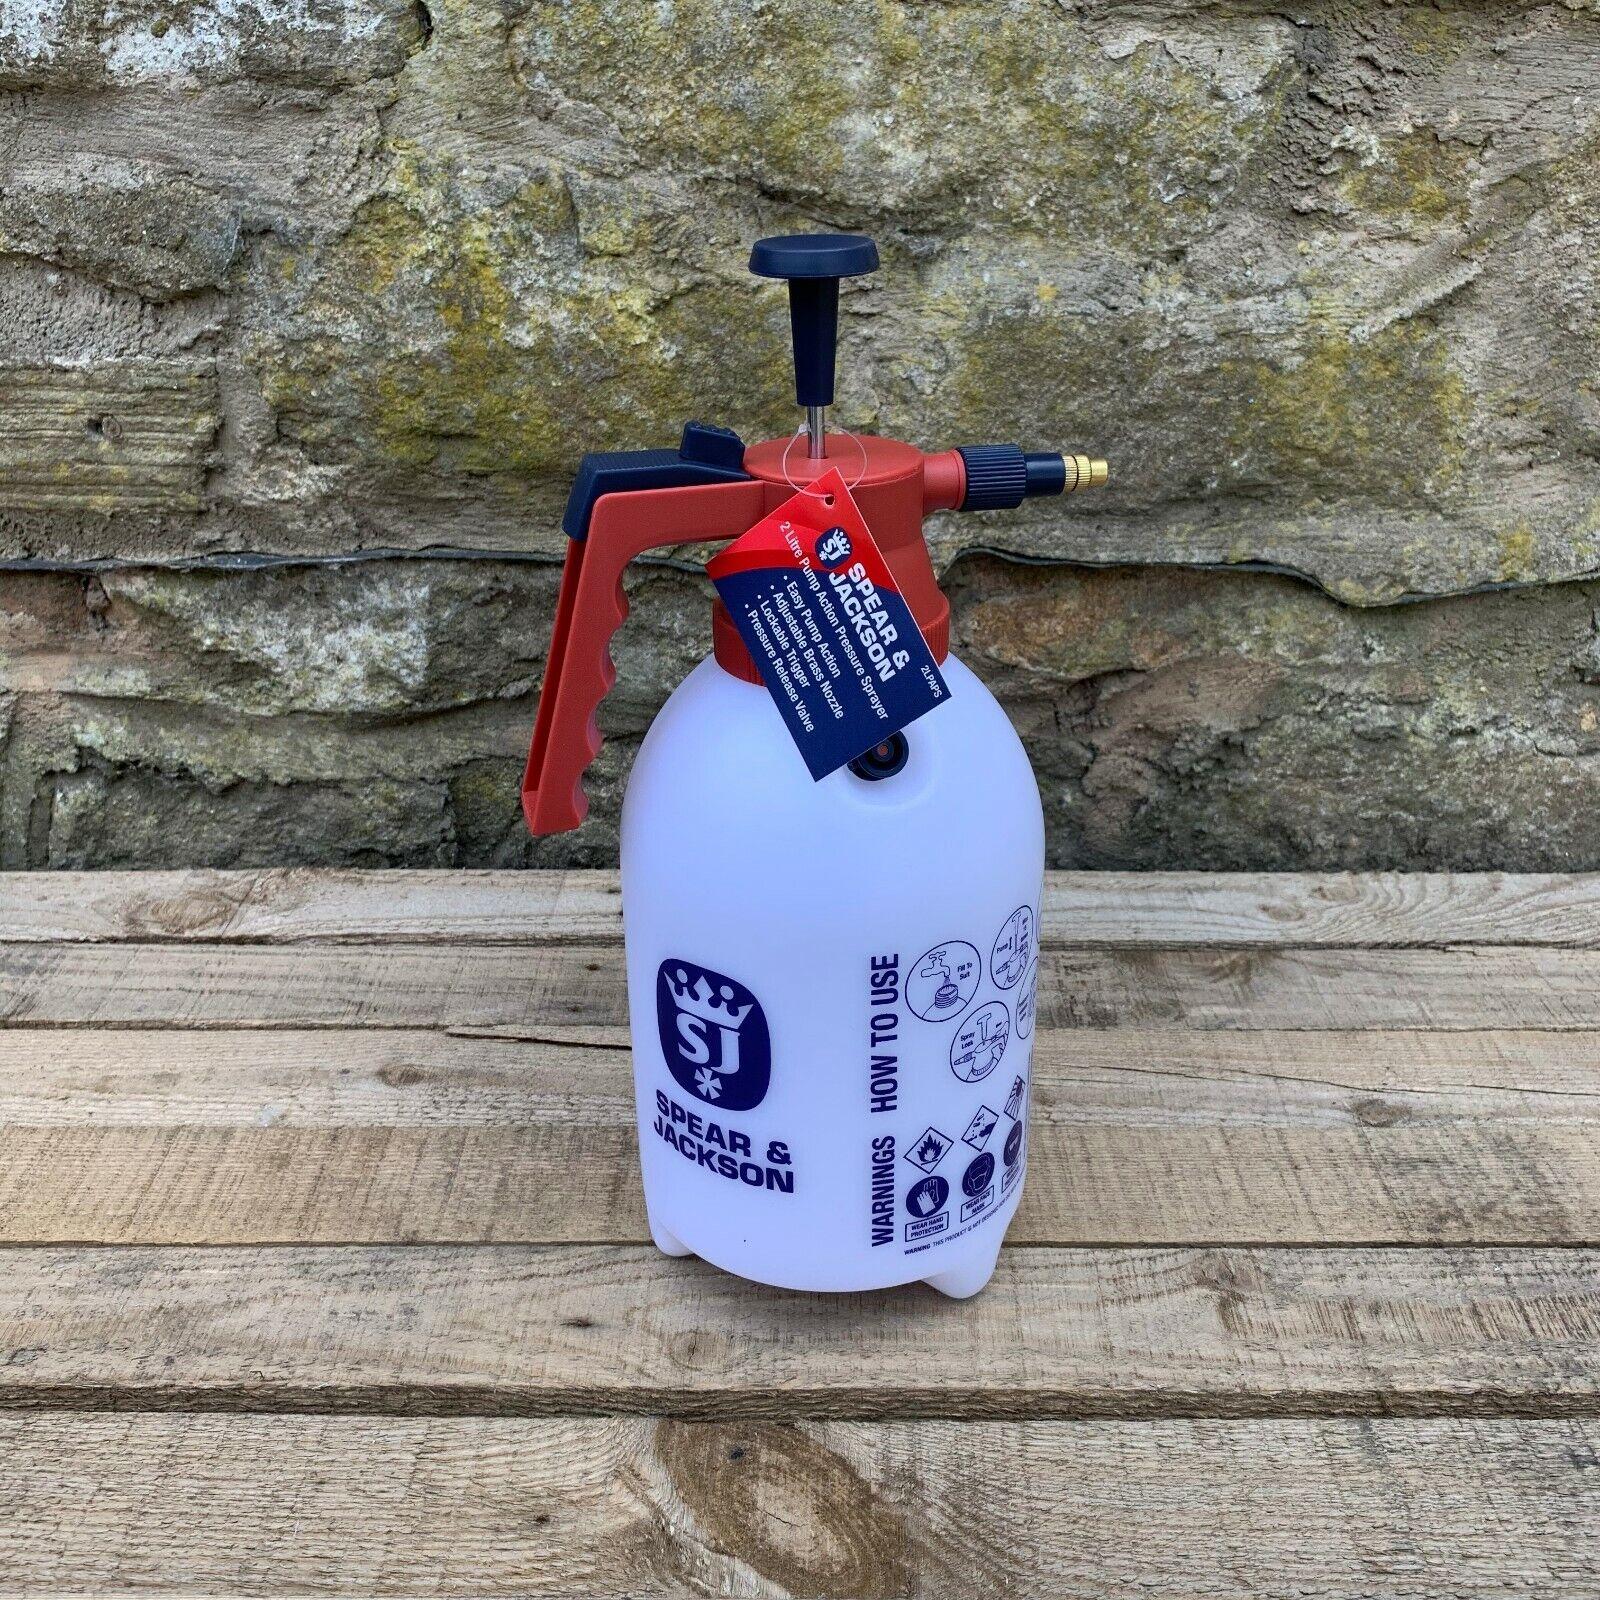 Spear & Jackson Garden 2 Litre Pump Action Pressure Sprayer - 2LTR